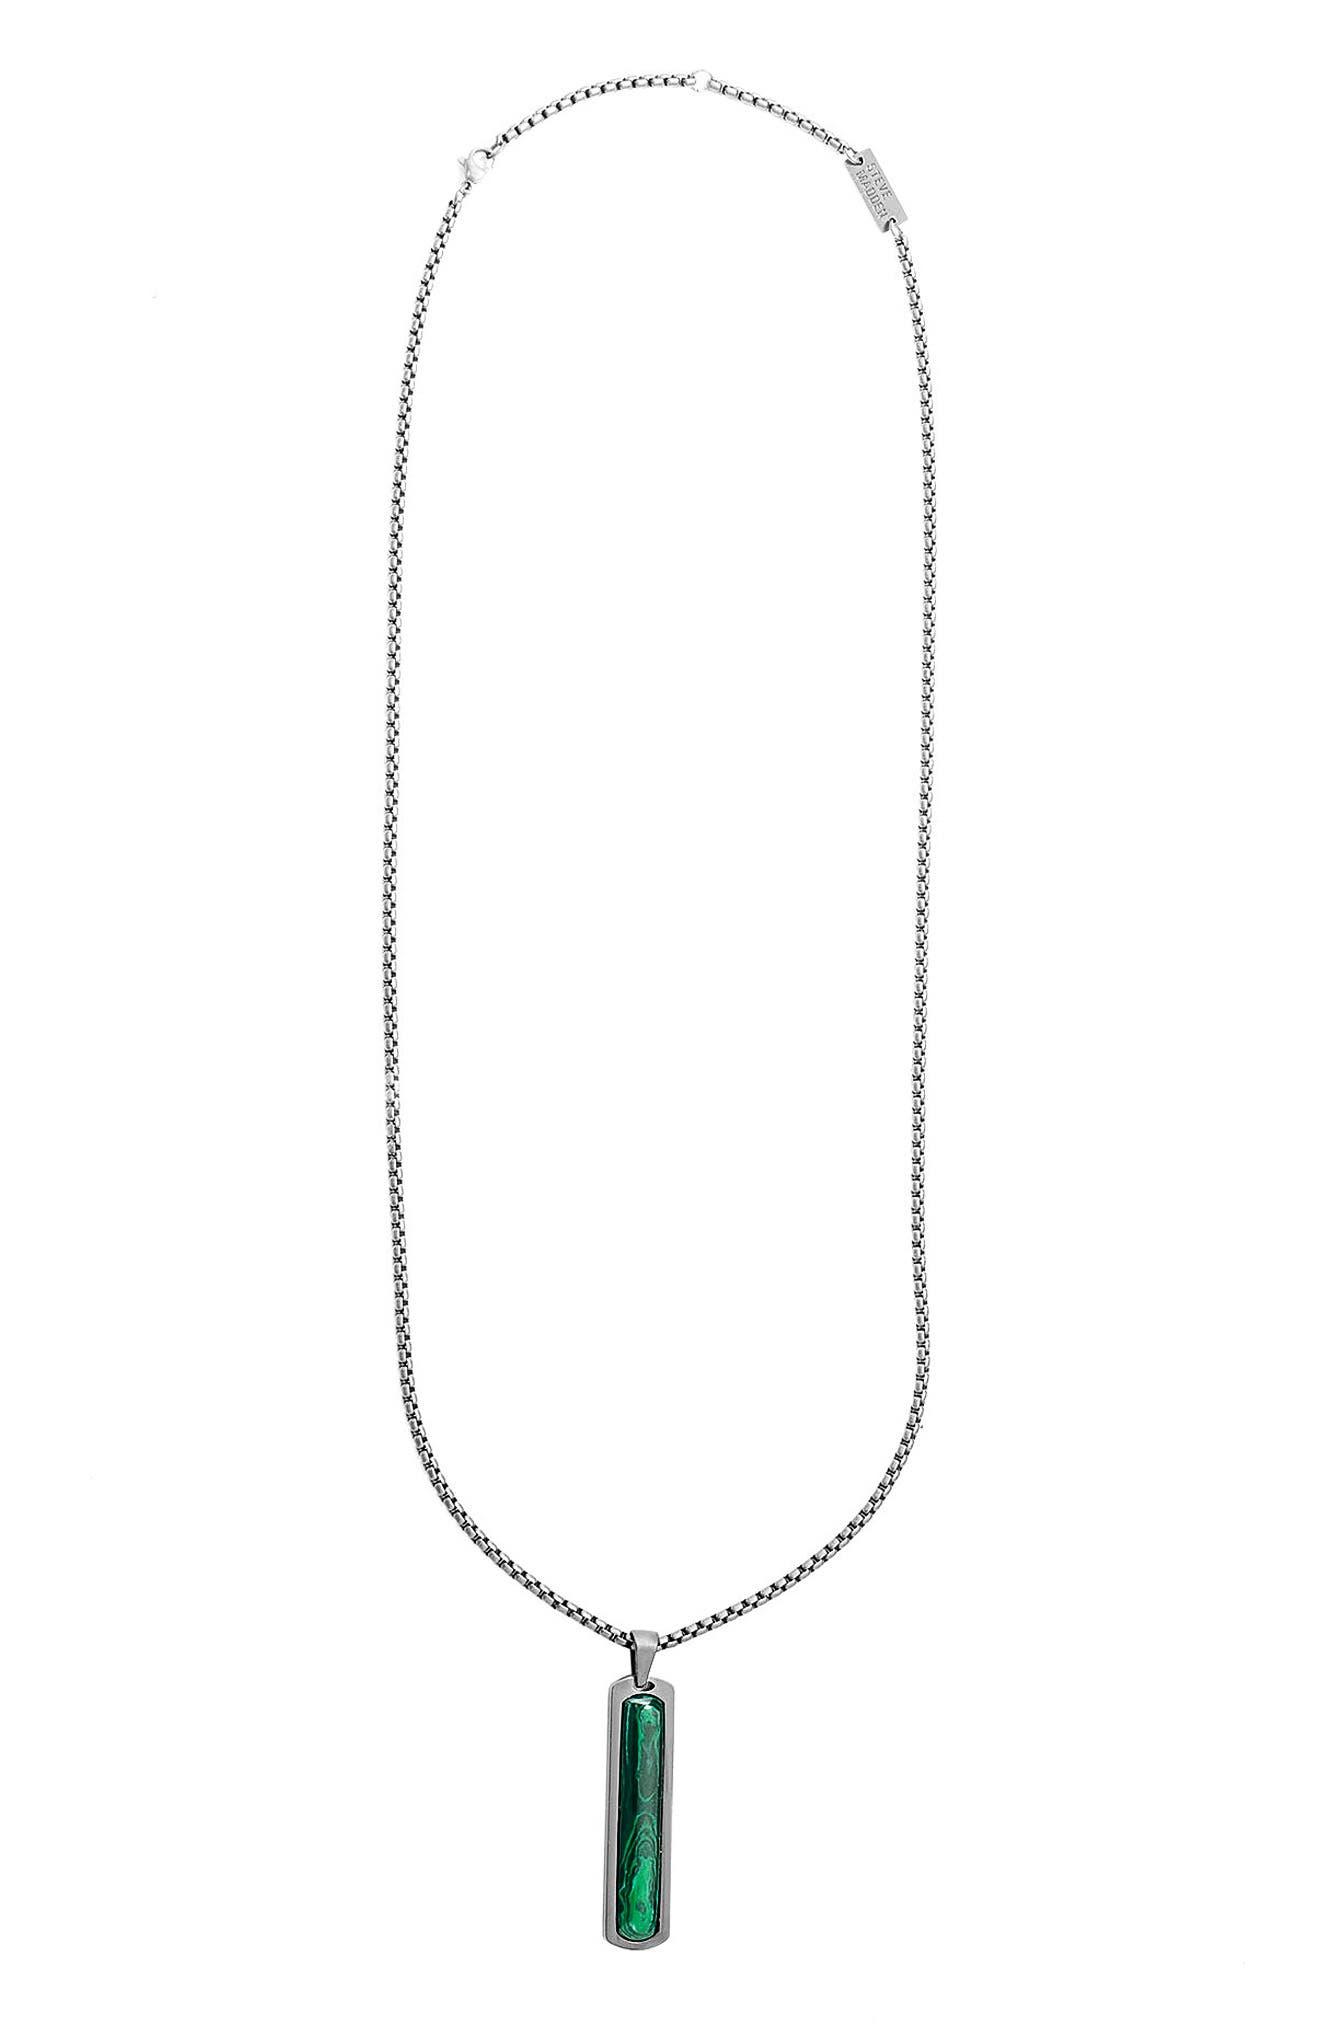 Oxidized Malachite Pendant Necklace,                         Main,                         color, Green